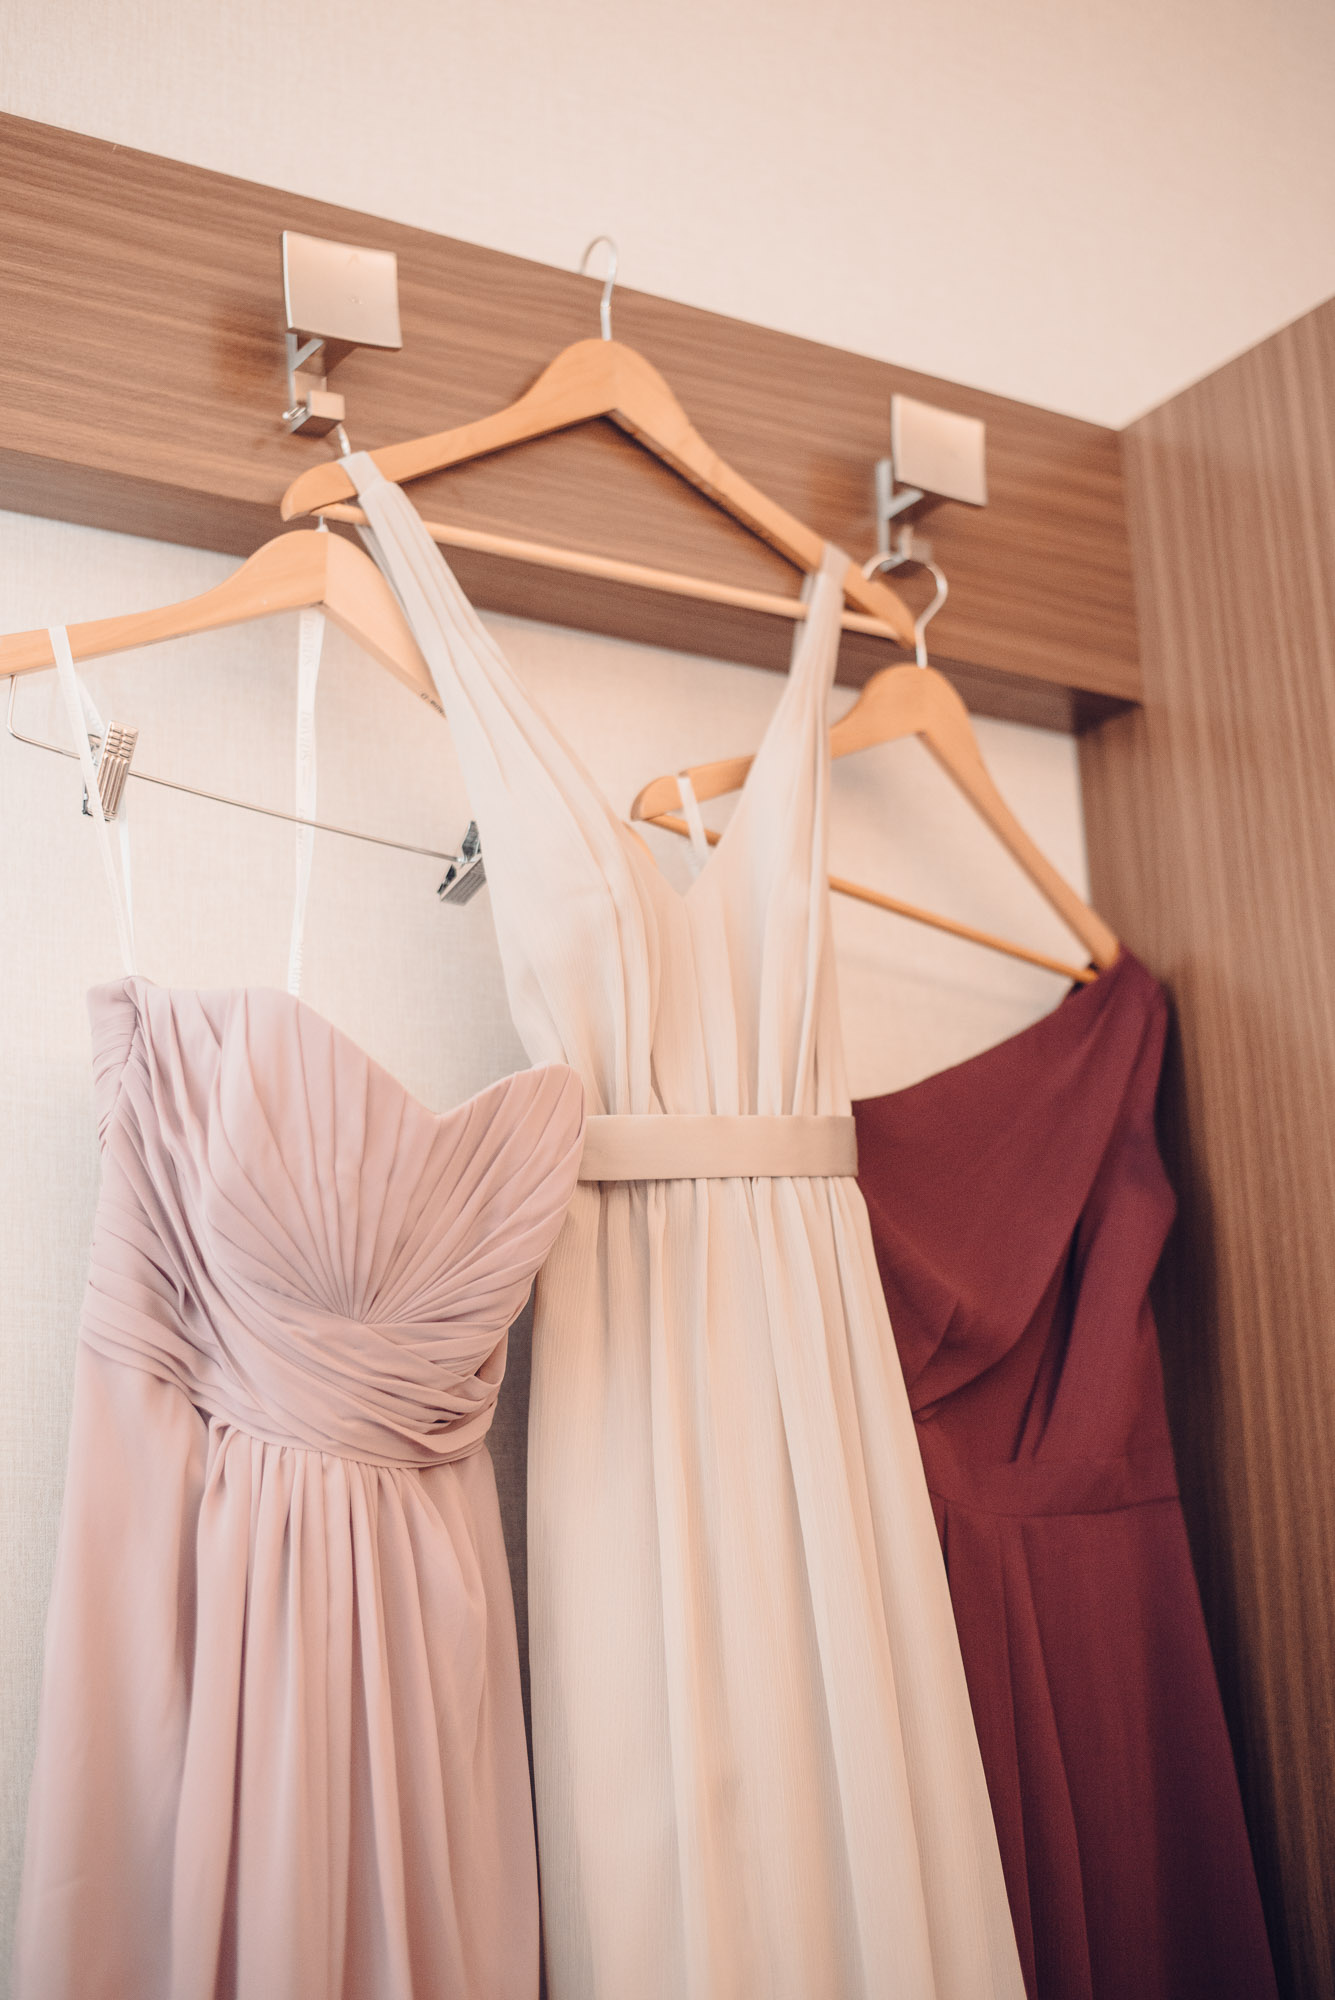 woodwinds_wedding_171020_web-12.jpg